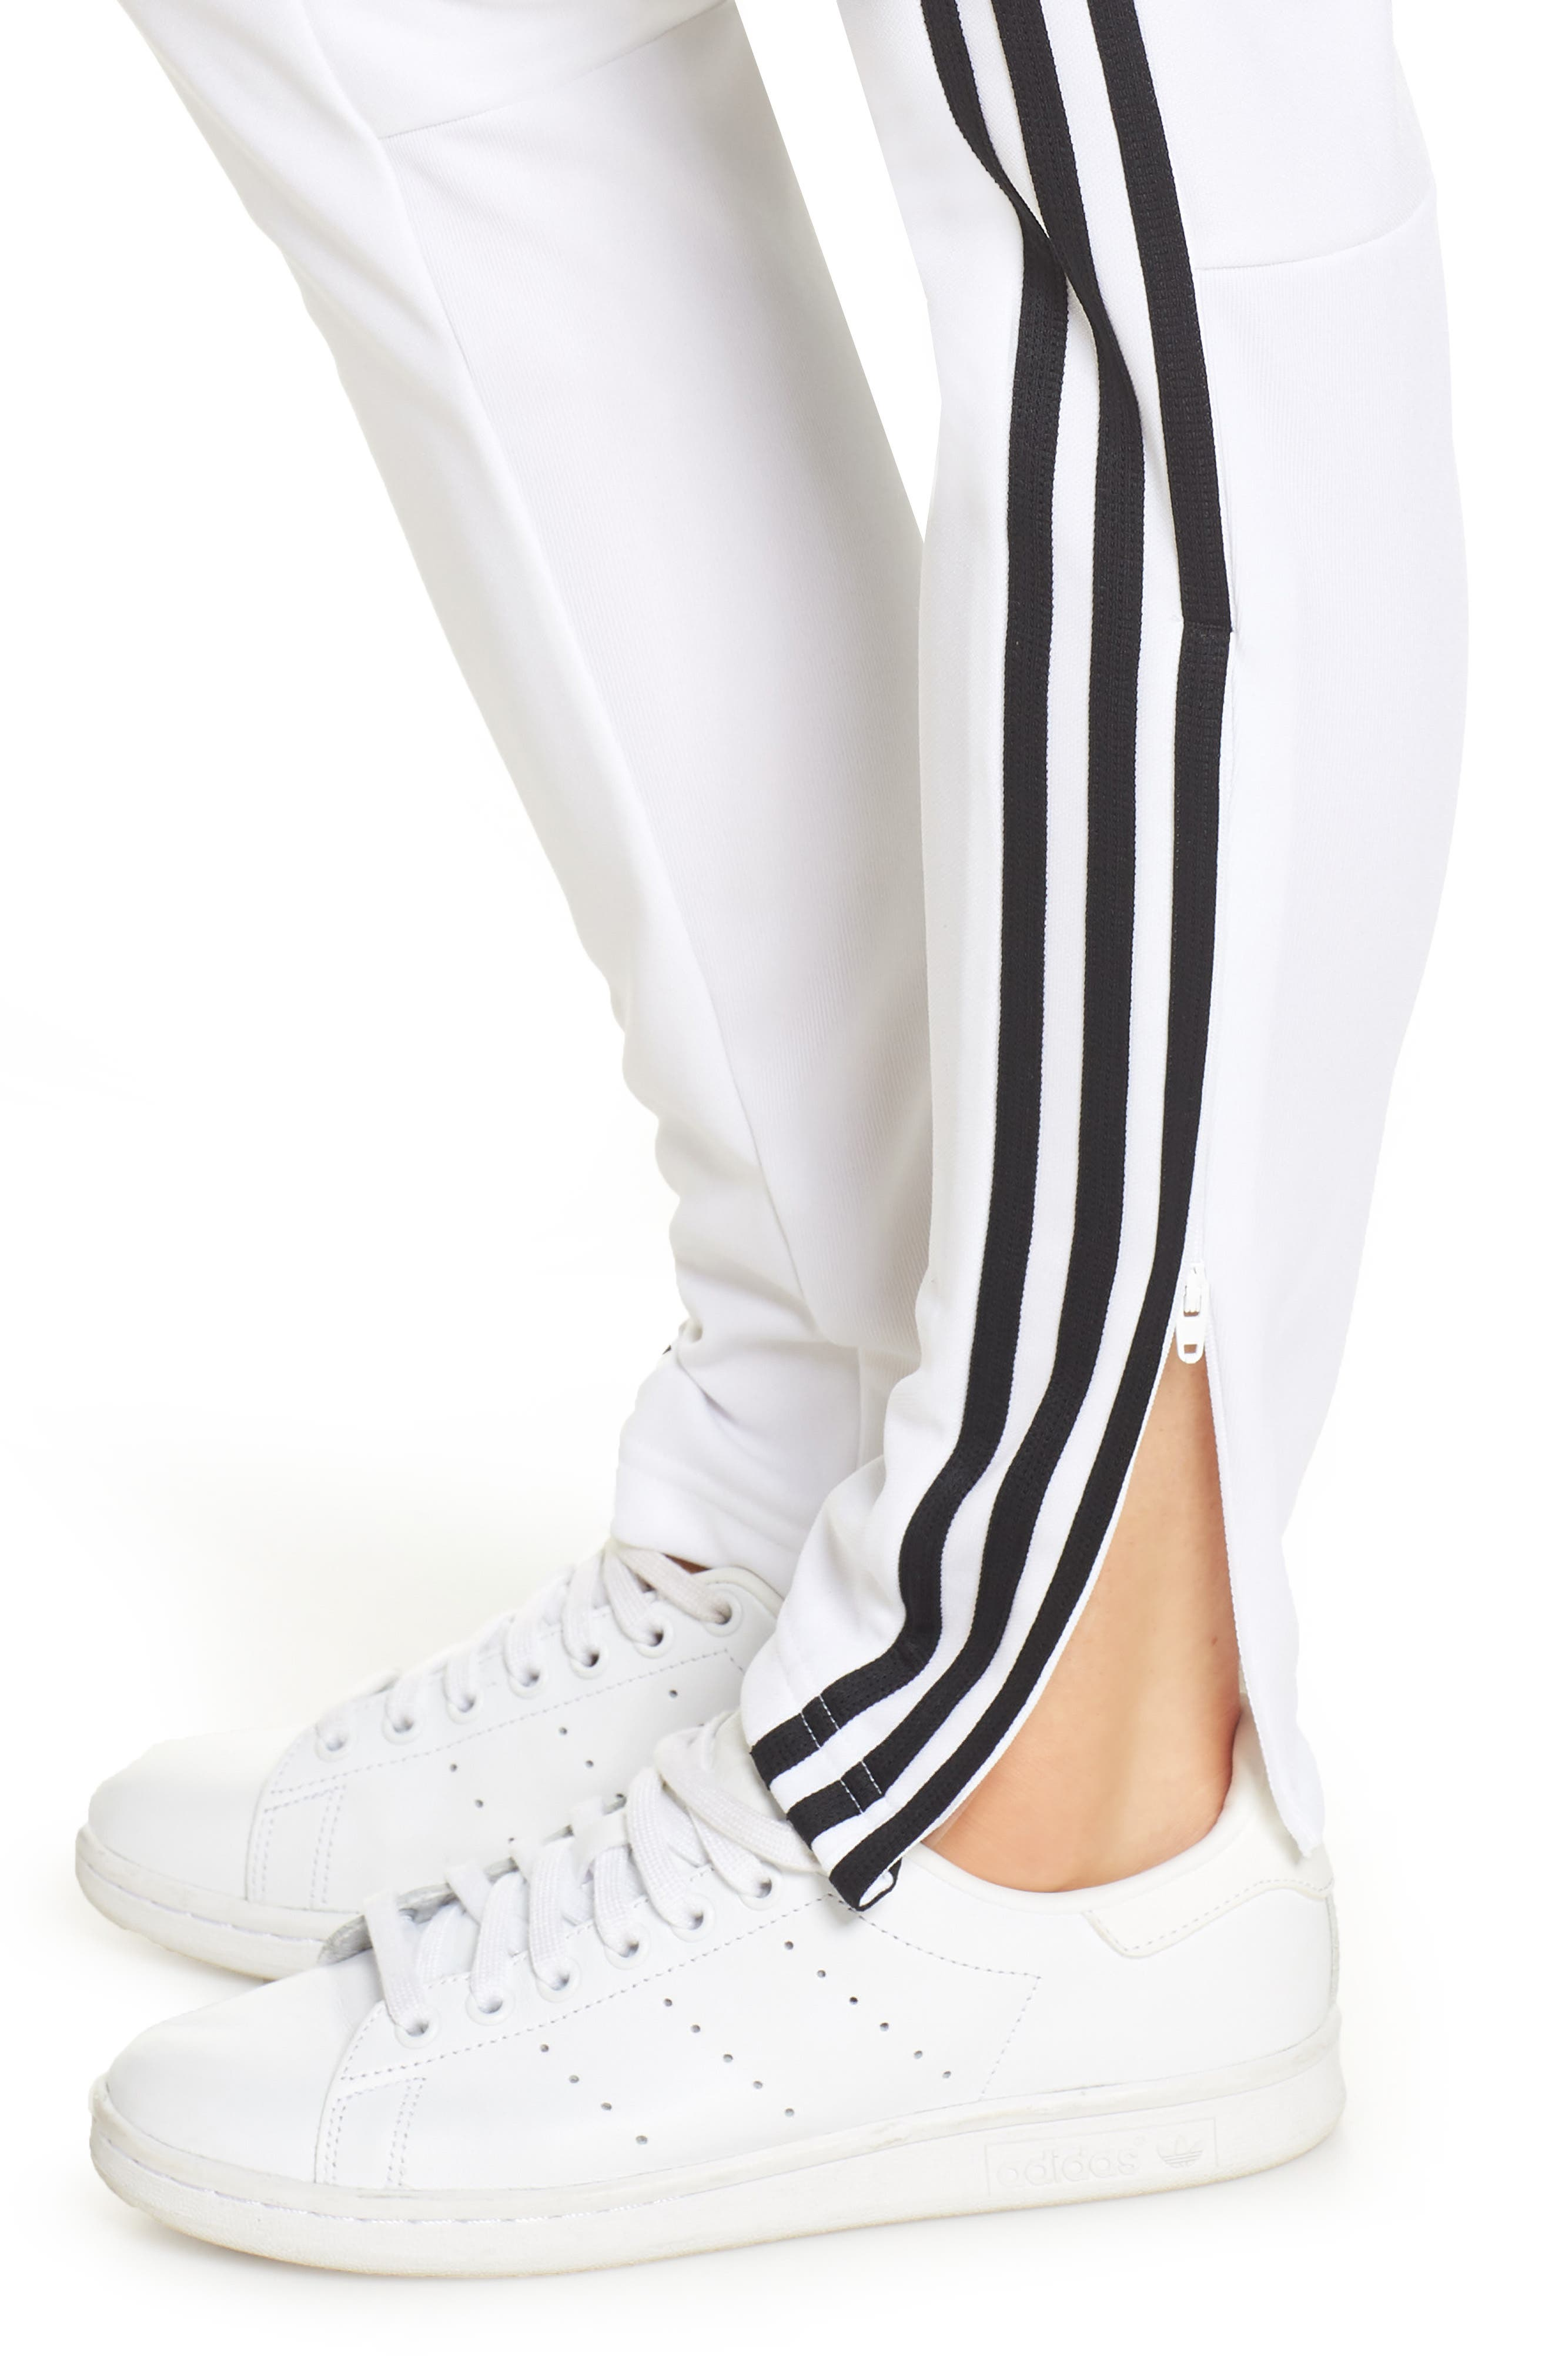 ADIDAS, Tiro 19 Training Pants, Alternate thumbnail 5, color, WHITE/ BLACK